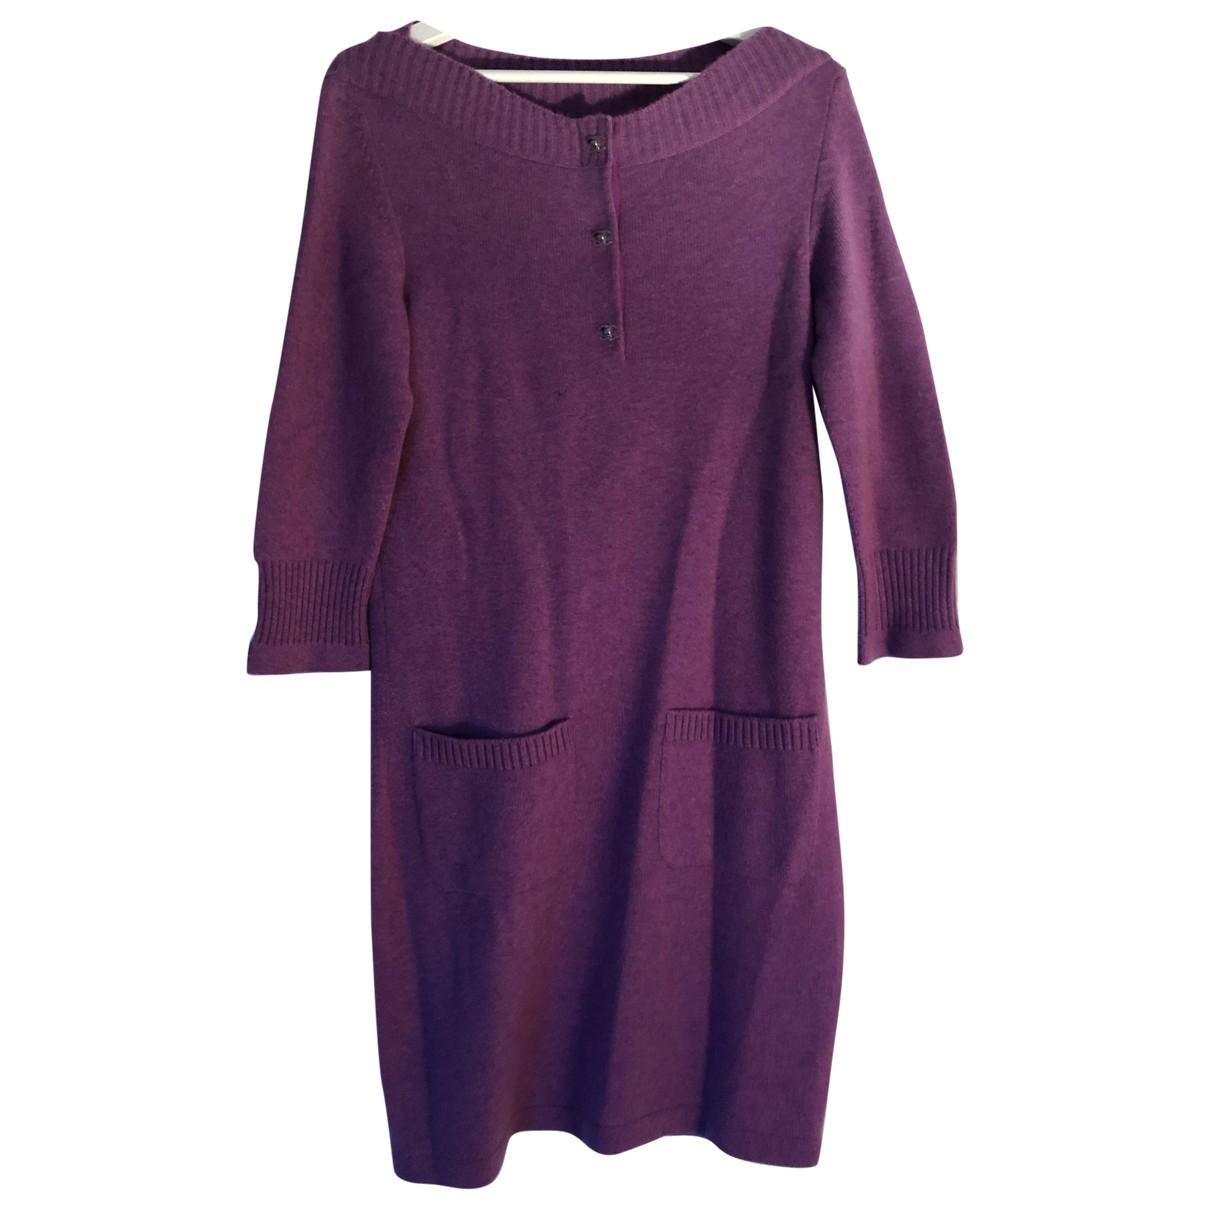 Chanel N Purple Cashmere dress for Women 38 FR